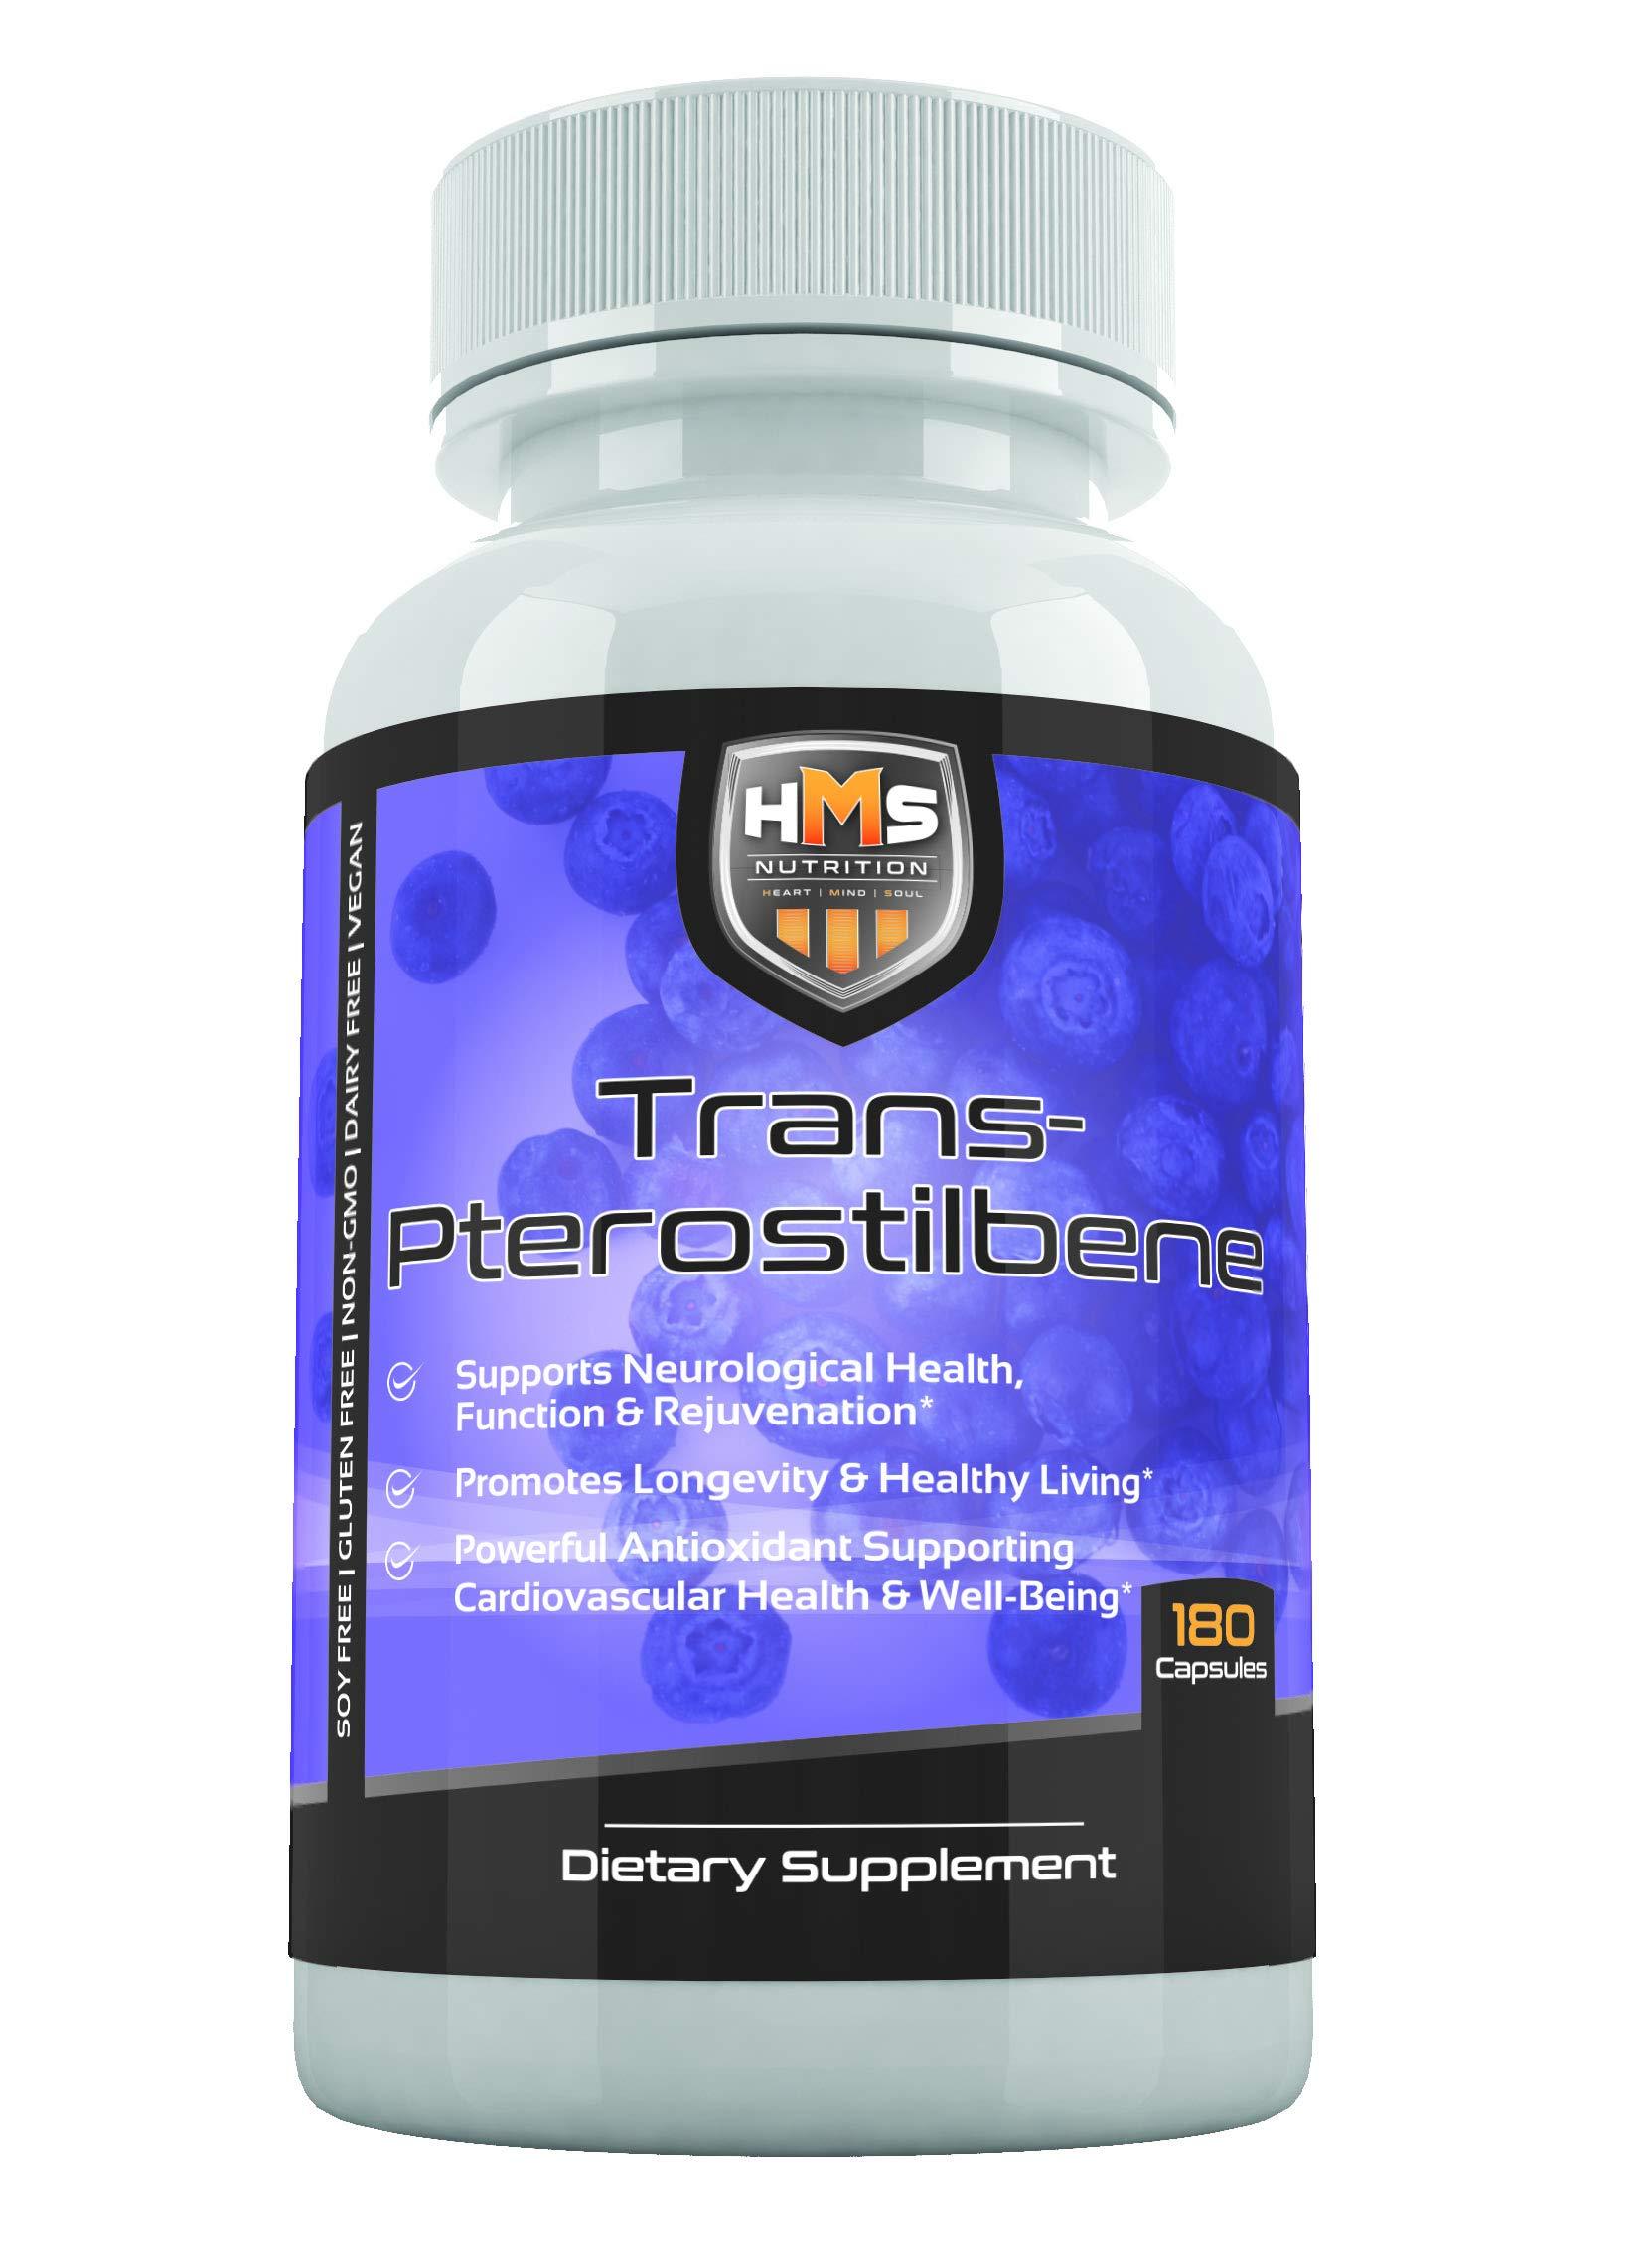 HMS Nutrition Potent Trans-Pterostilbene - 200mg, 180 Vegan Capsules - Anti-Aging, Anti-Inflammatory, Antioxidant Supplement - Gluten, Soy & Dairy Free